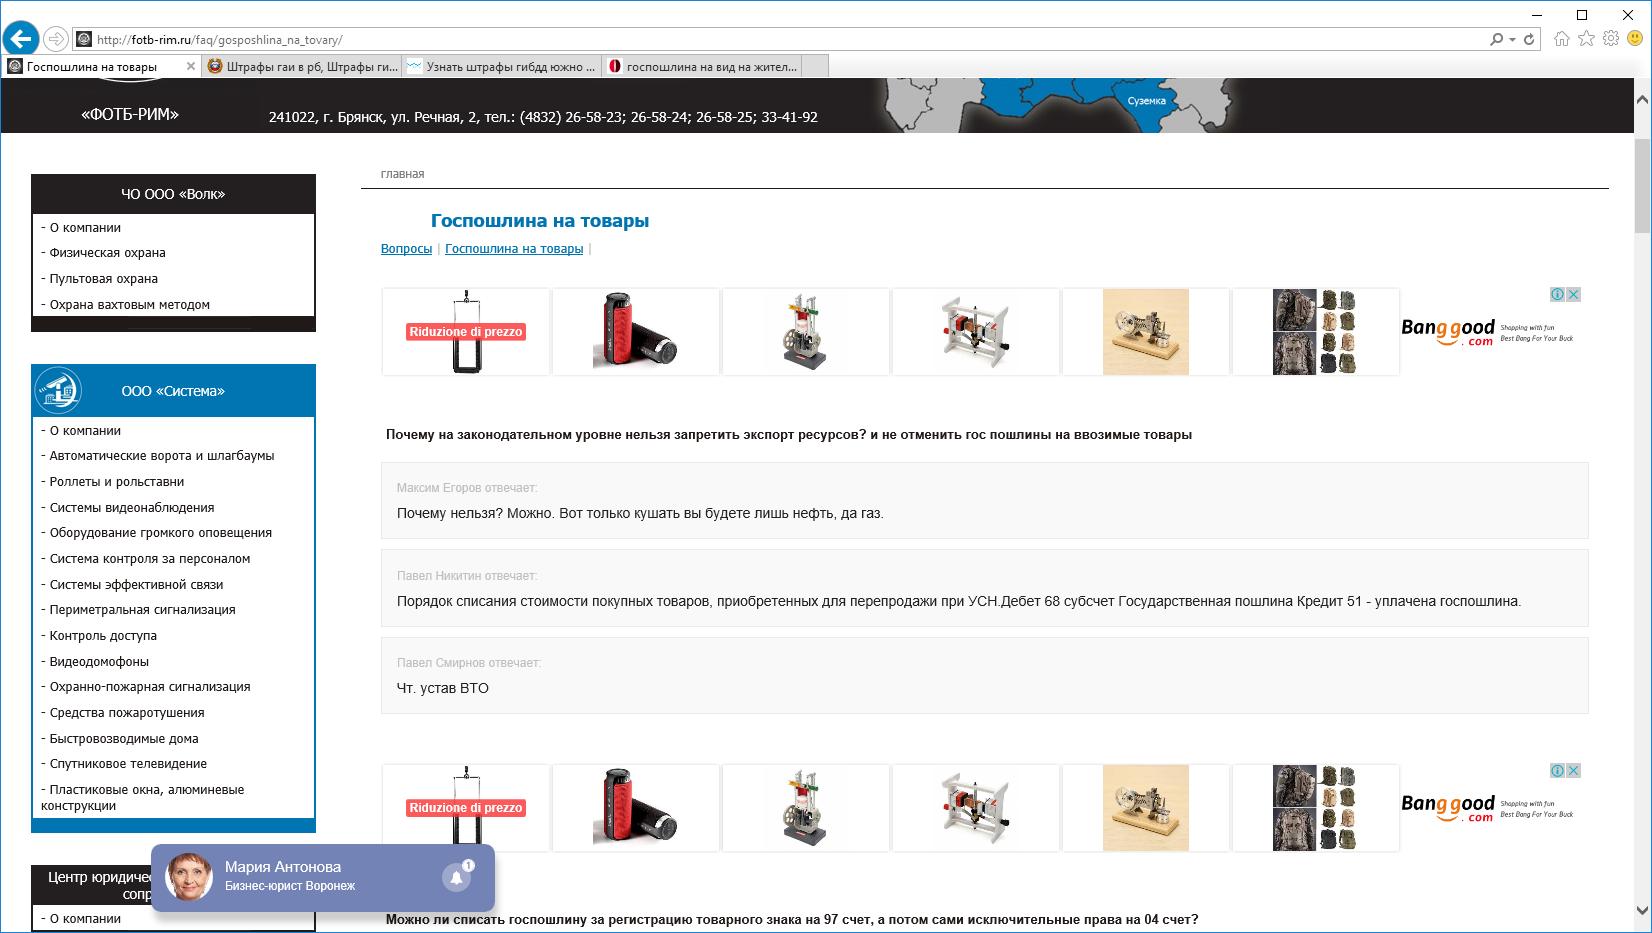 Seo на сайтах конструкторах сайты на одном ip seo